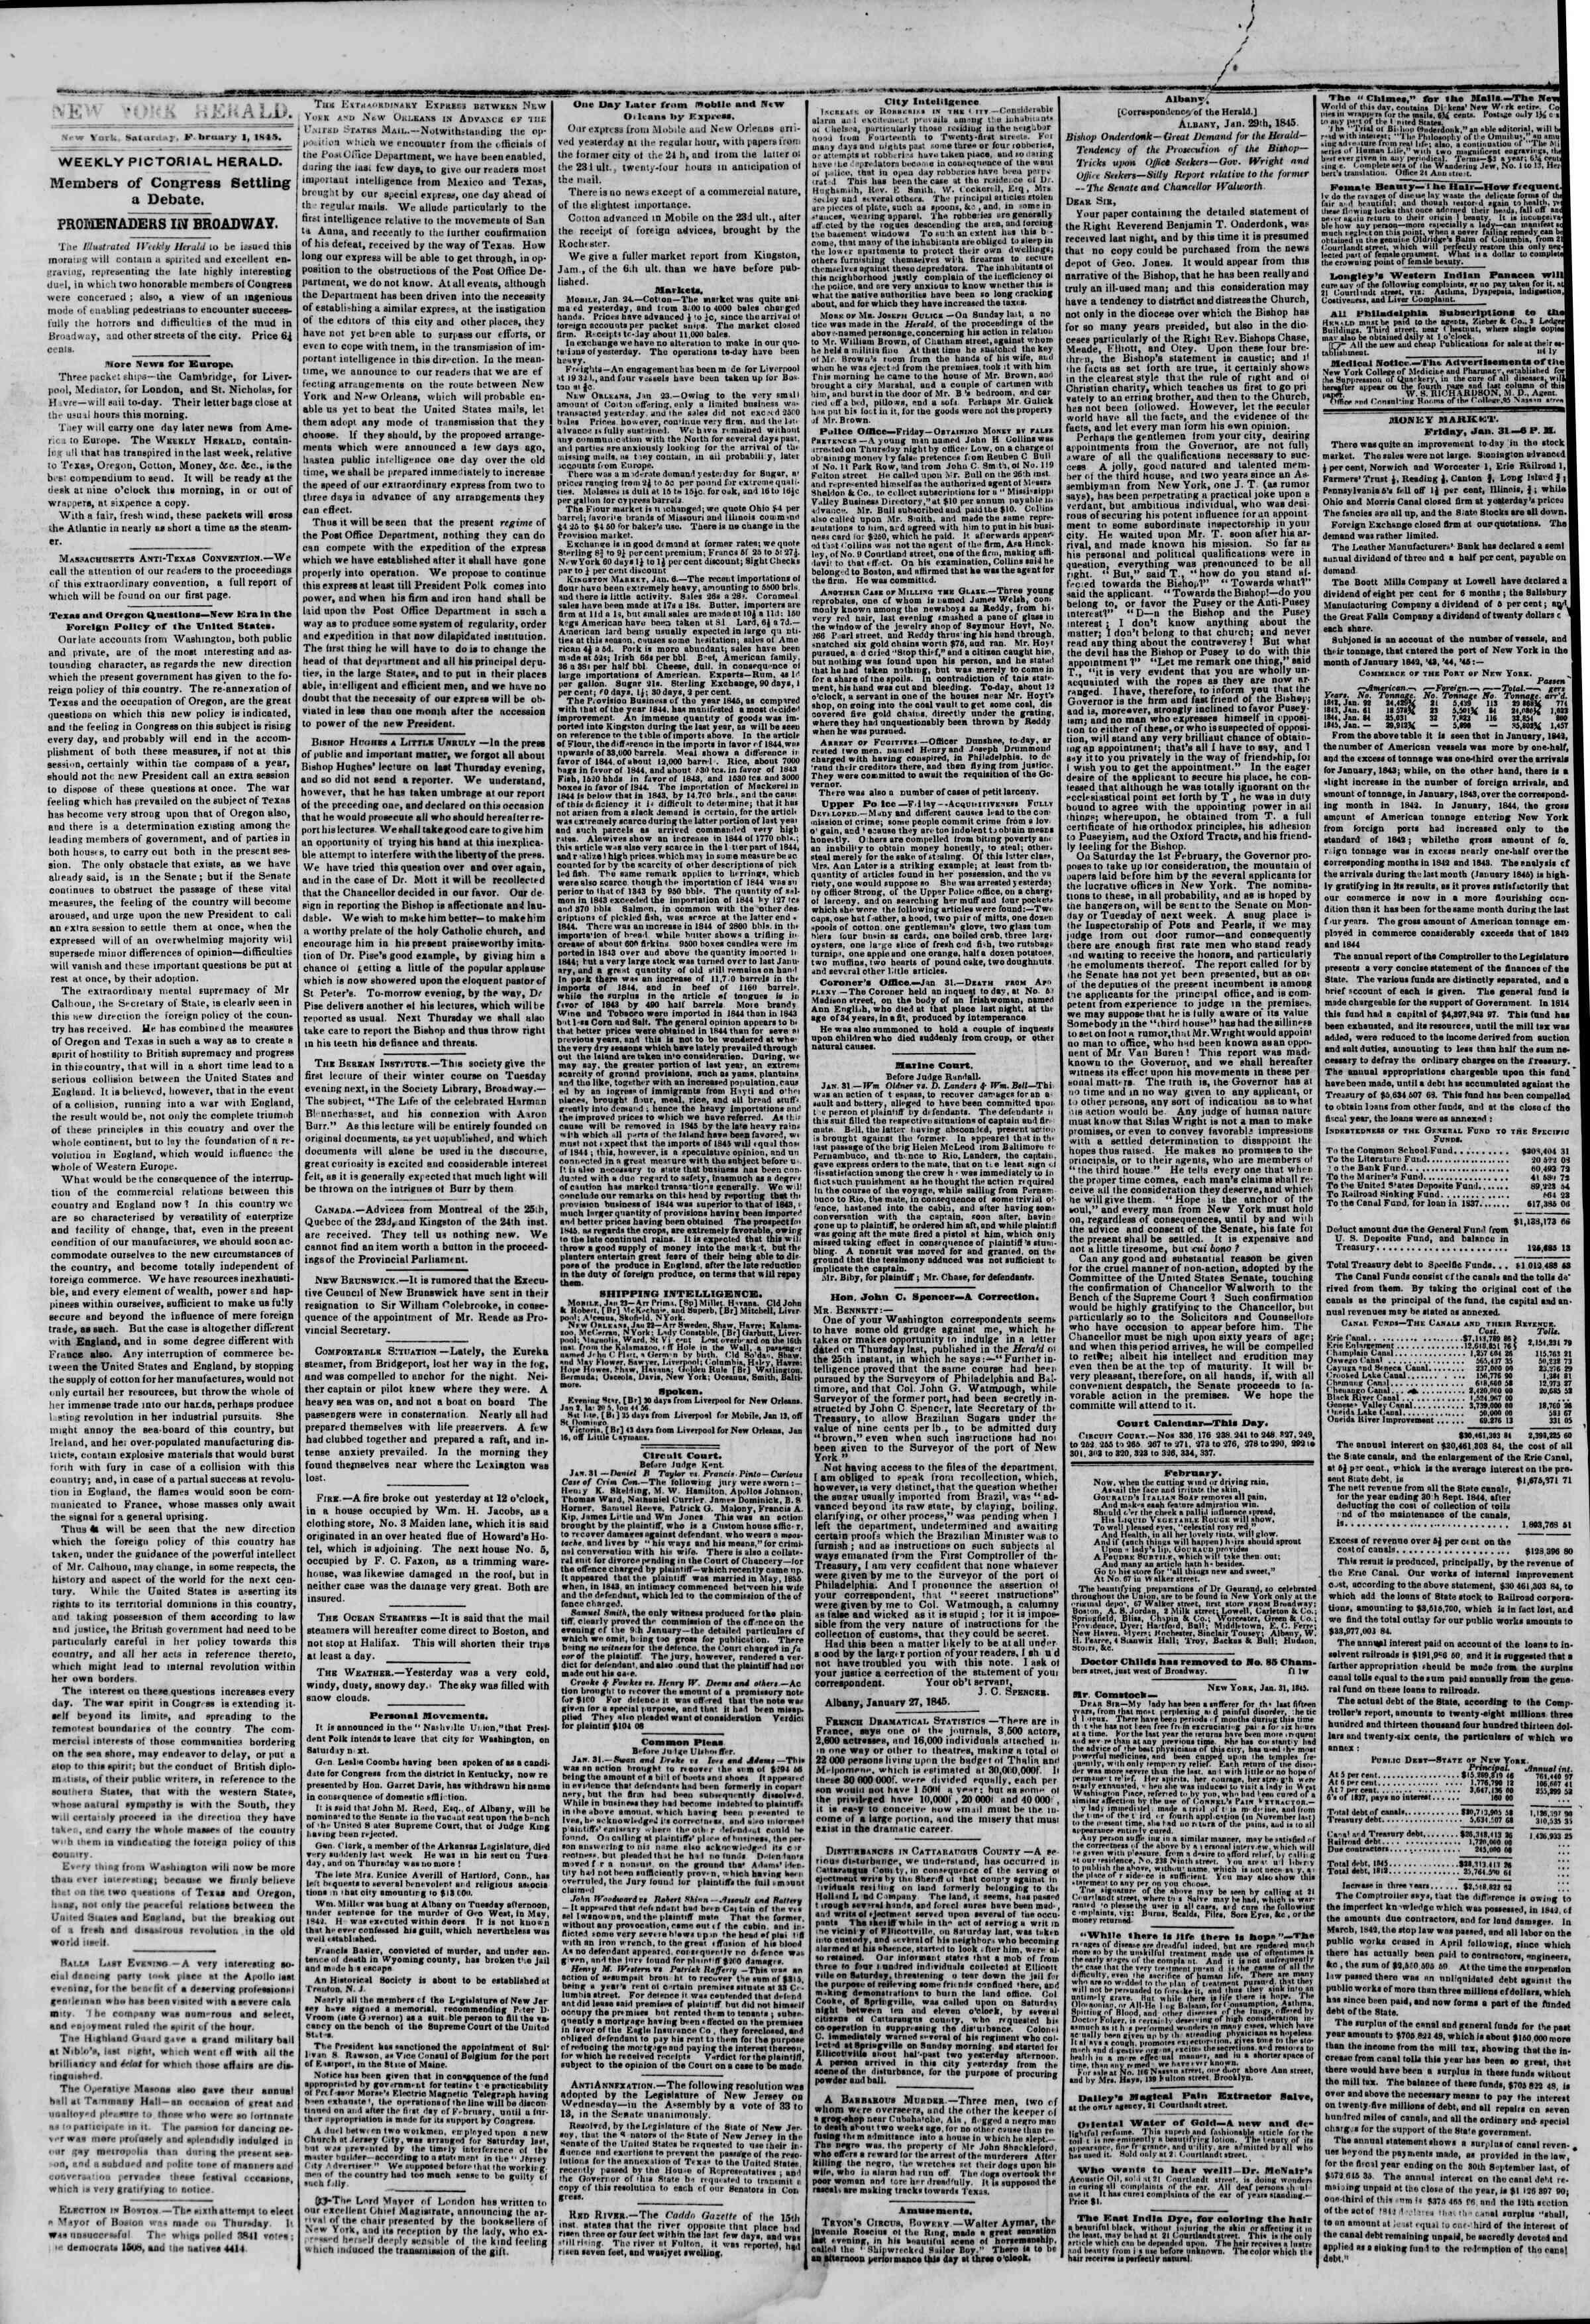 February 1, 1845 Tarihli The New York Herald Gazetesi Sayfa 2